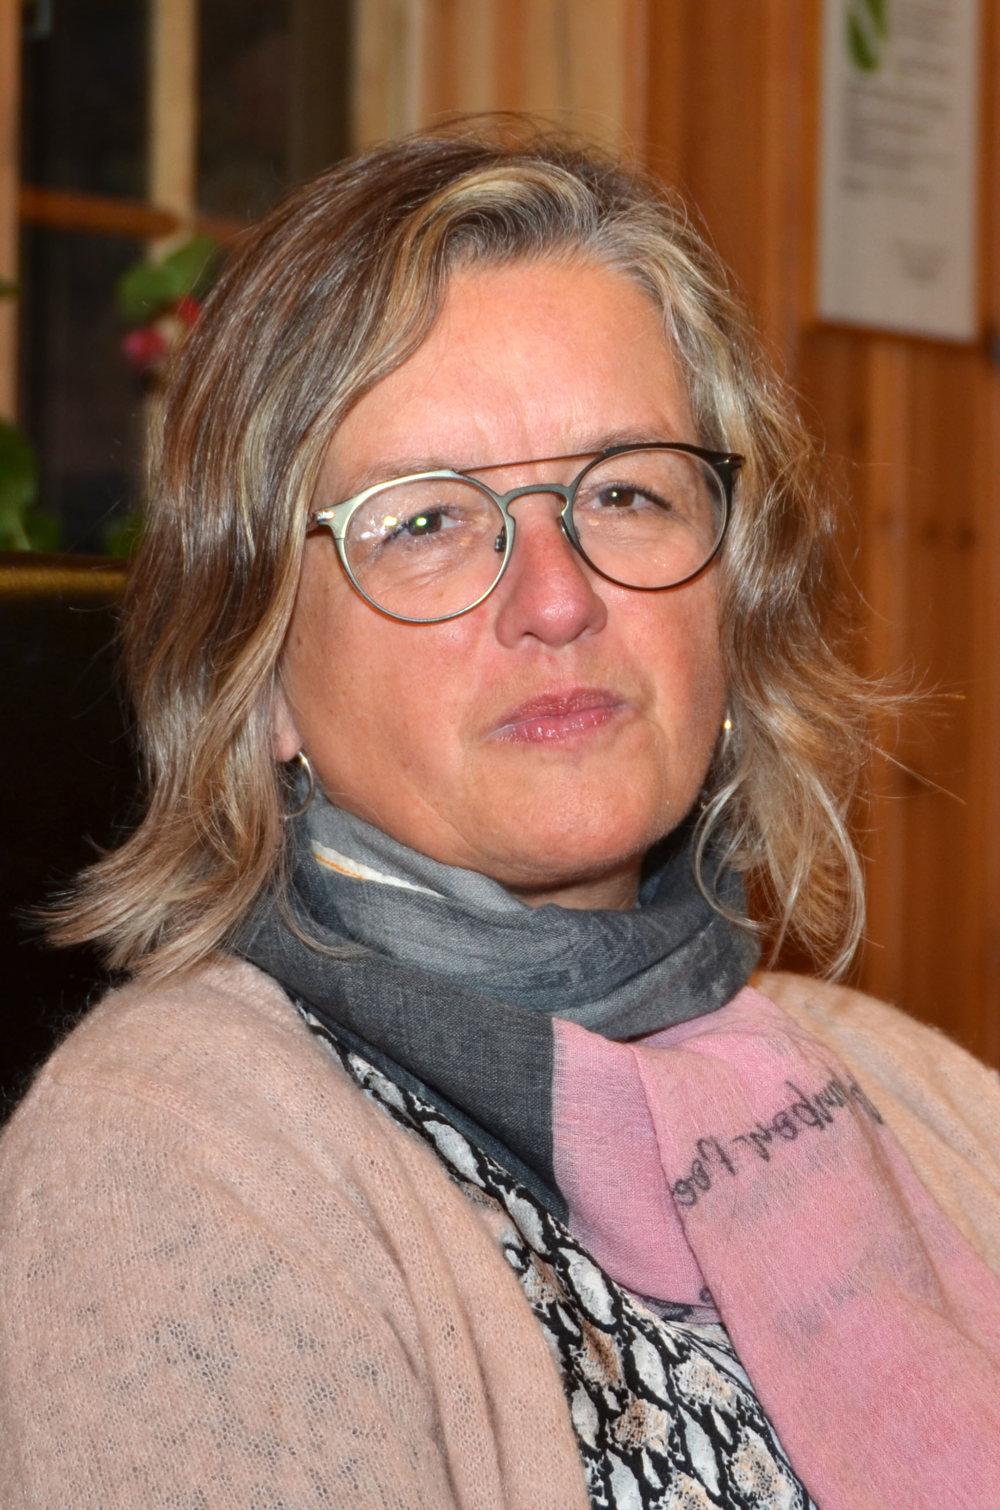 Lina Mørk style=